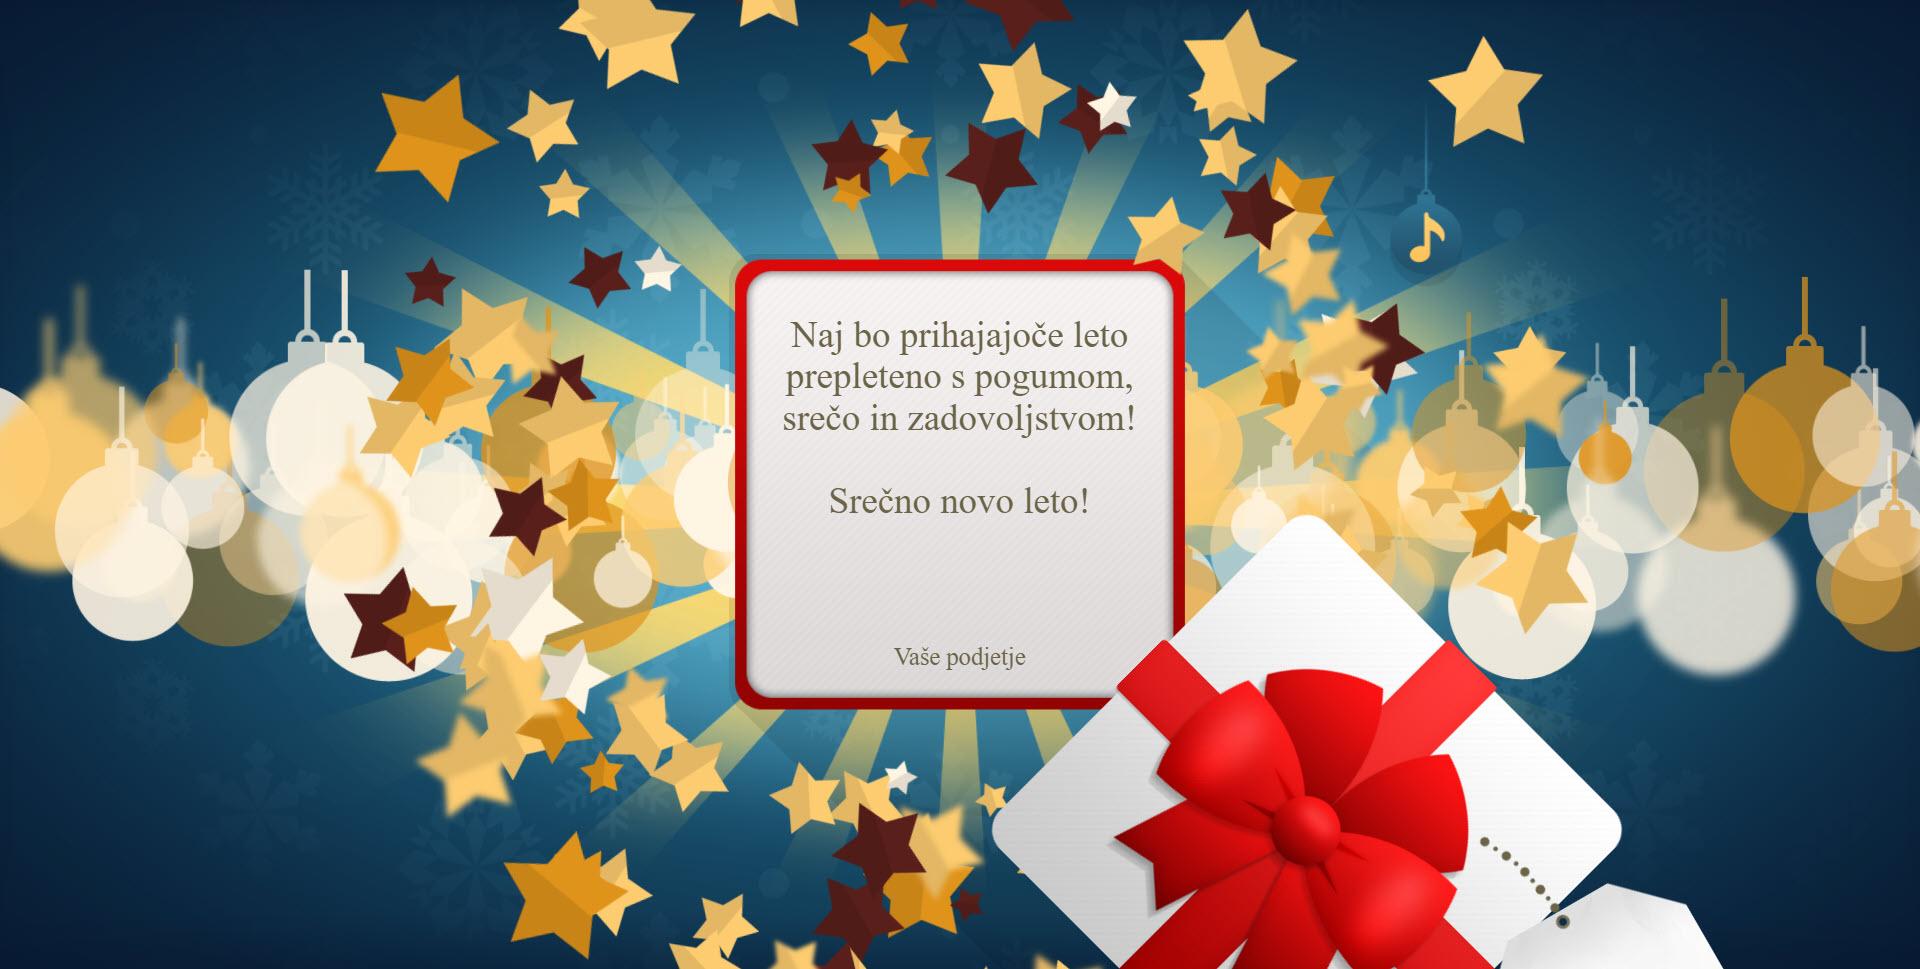 christmas card gift for you version blue - Naročilo voščilnice